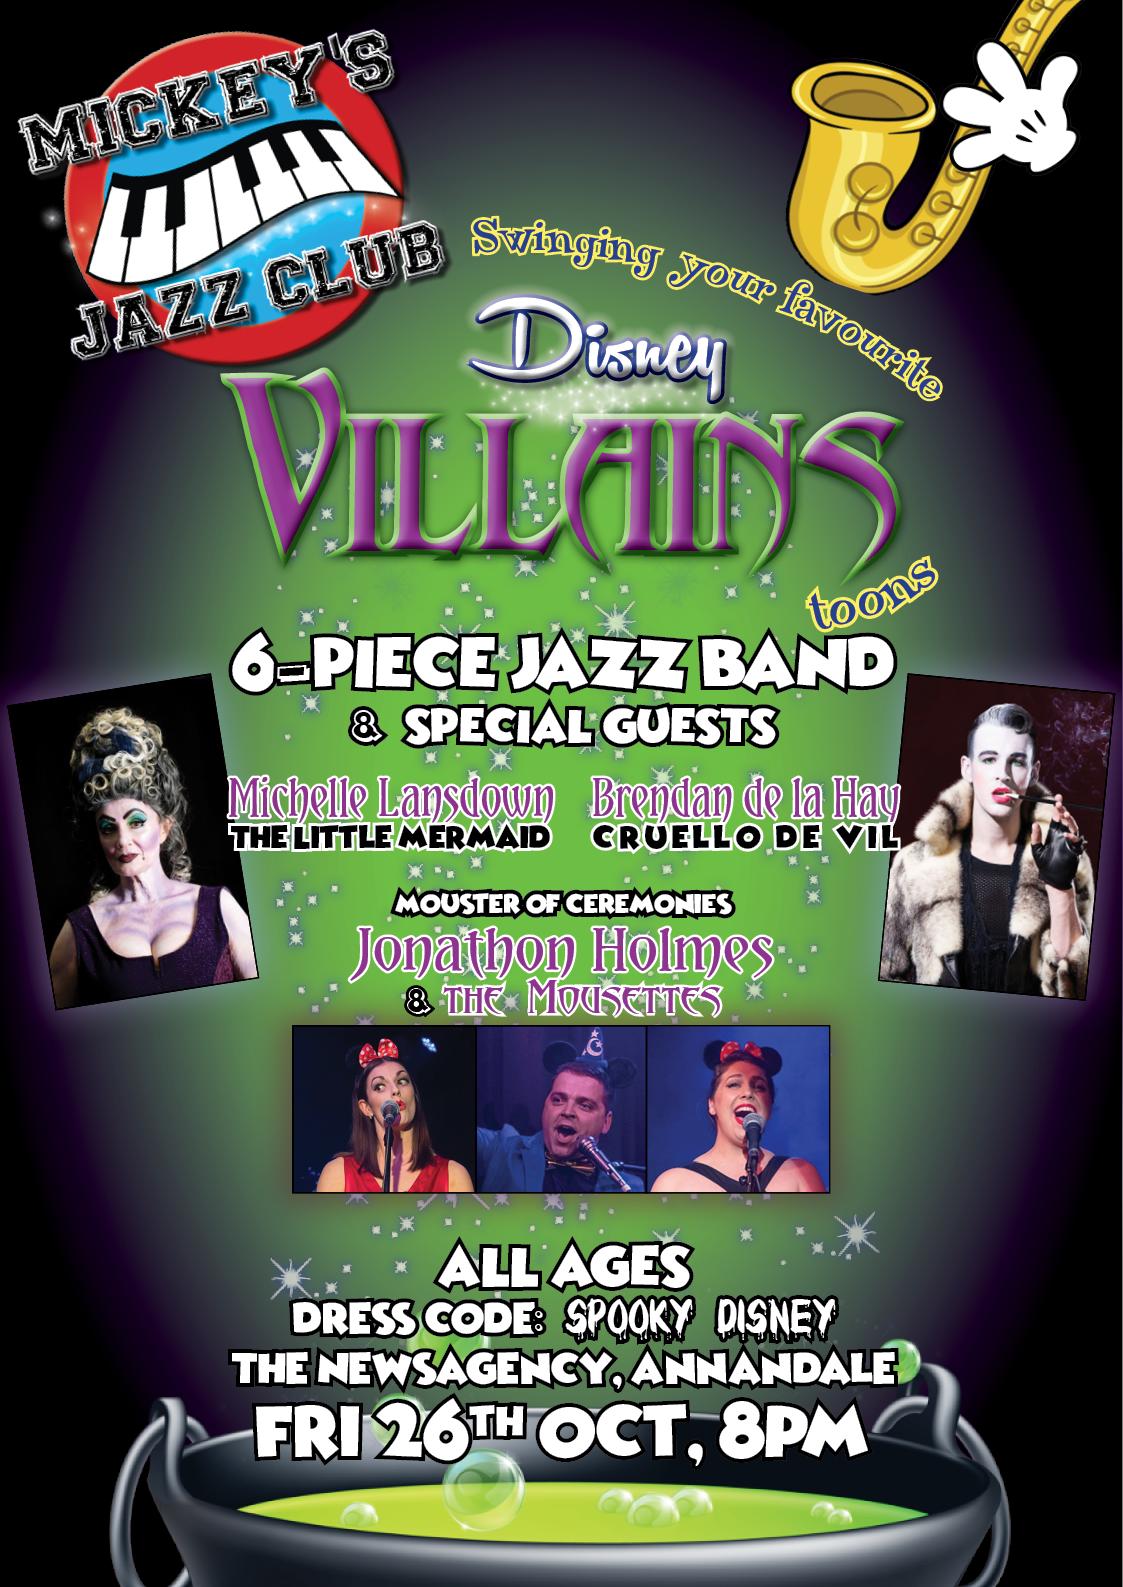 villains poster - Jonathon Holmes.png